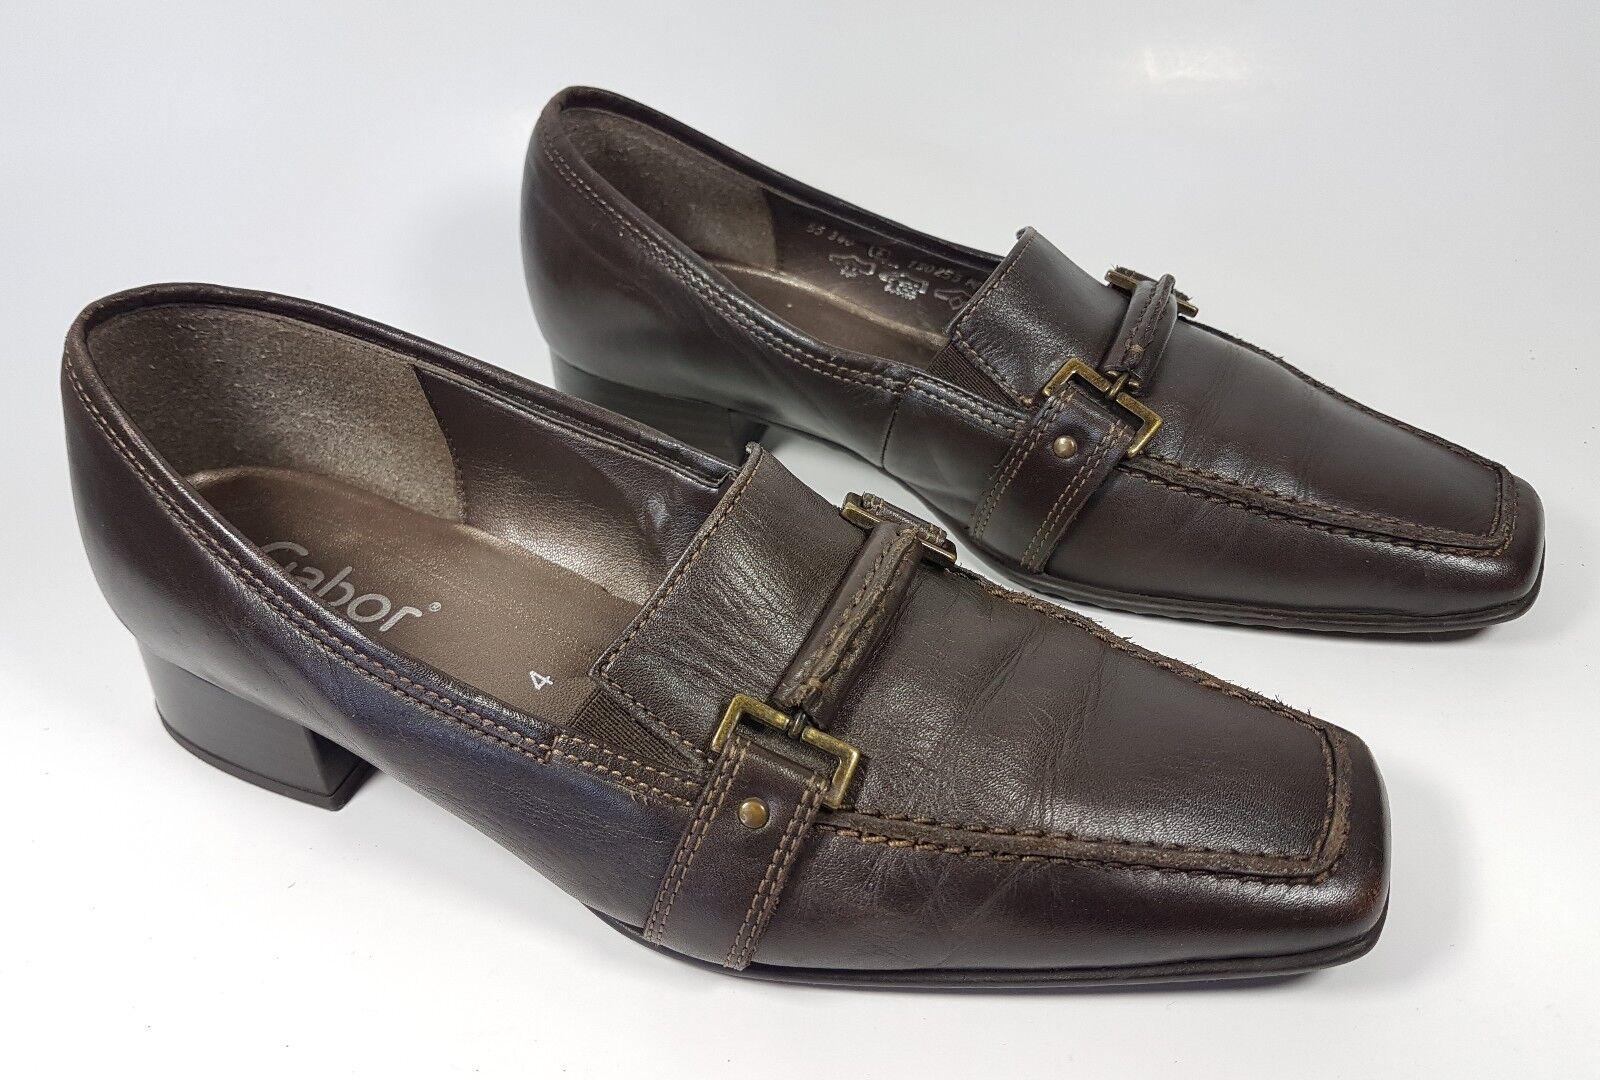 Gabor brown leather low block heel shoes uk 4 eu 37 super condition